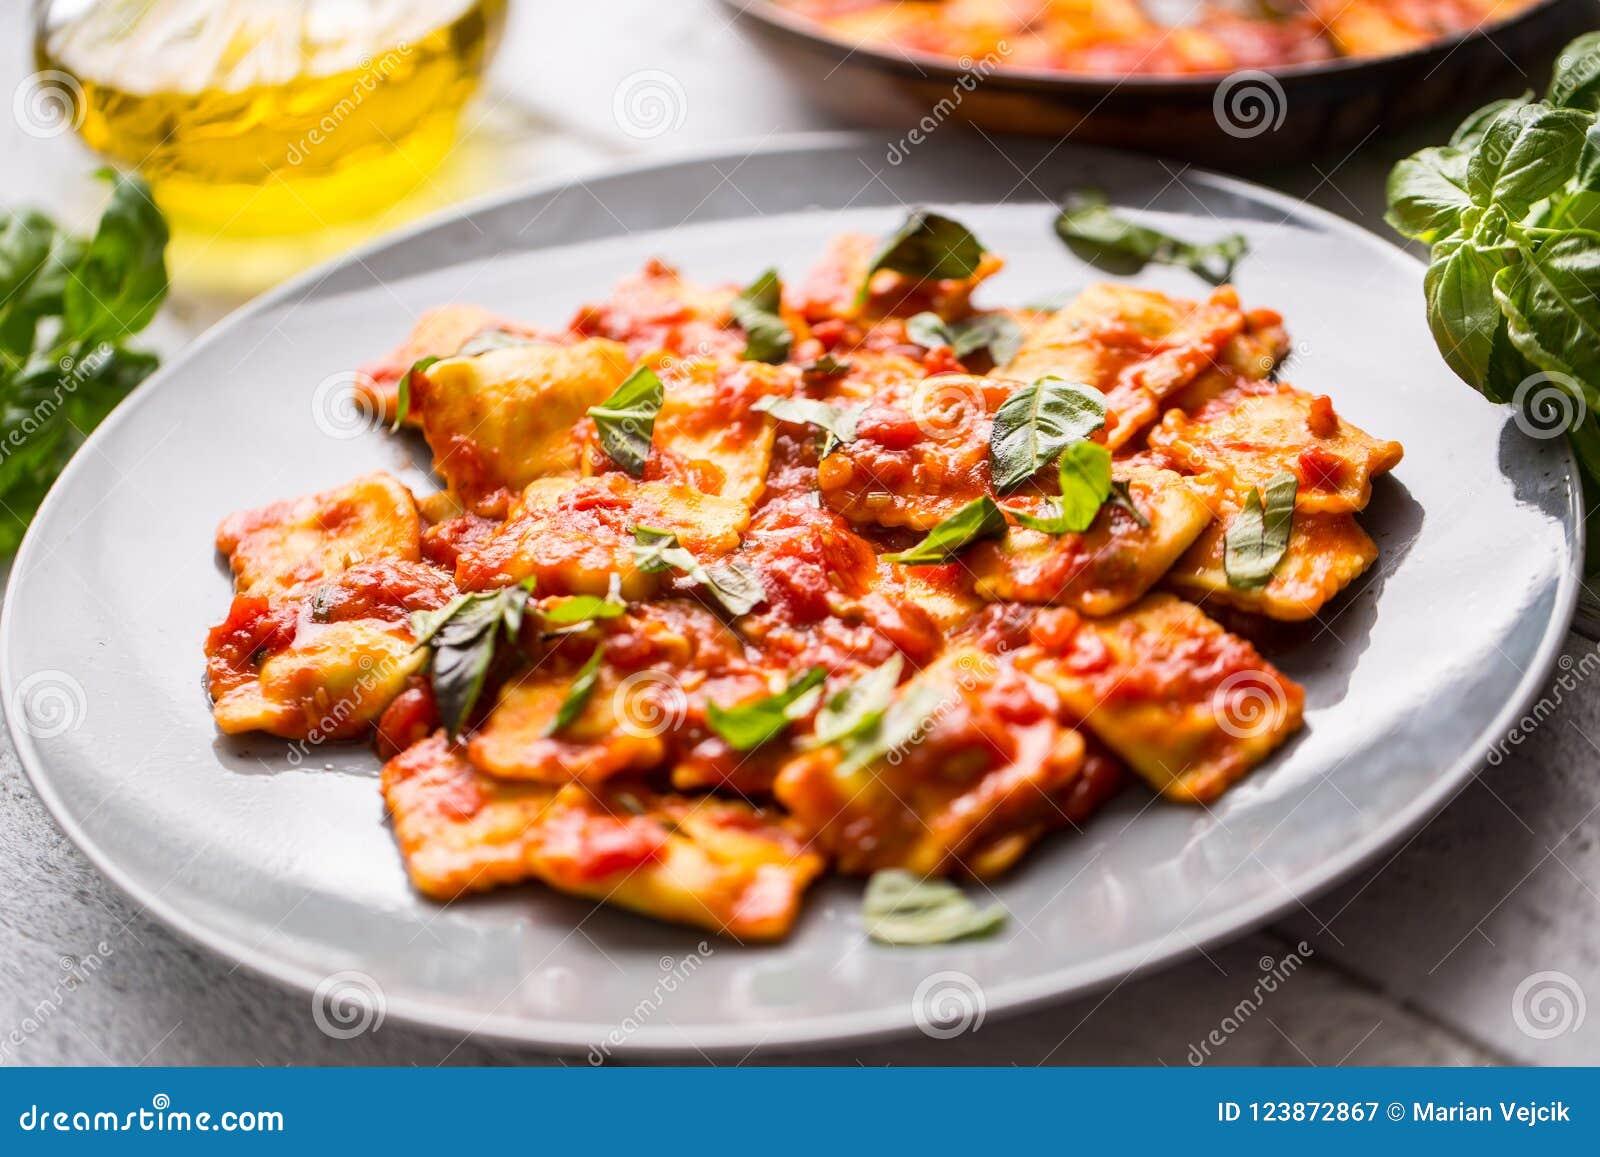 Italian or mediterranean food pasta ravioli of tomato sauce.